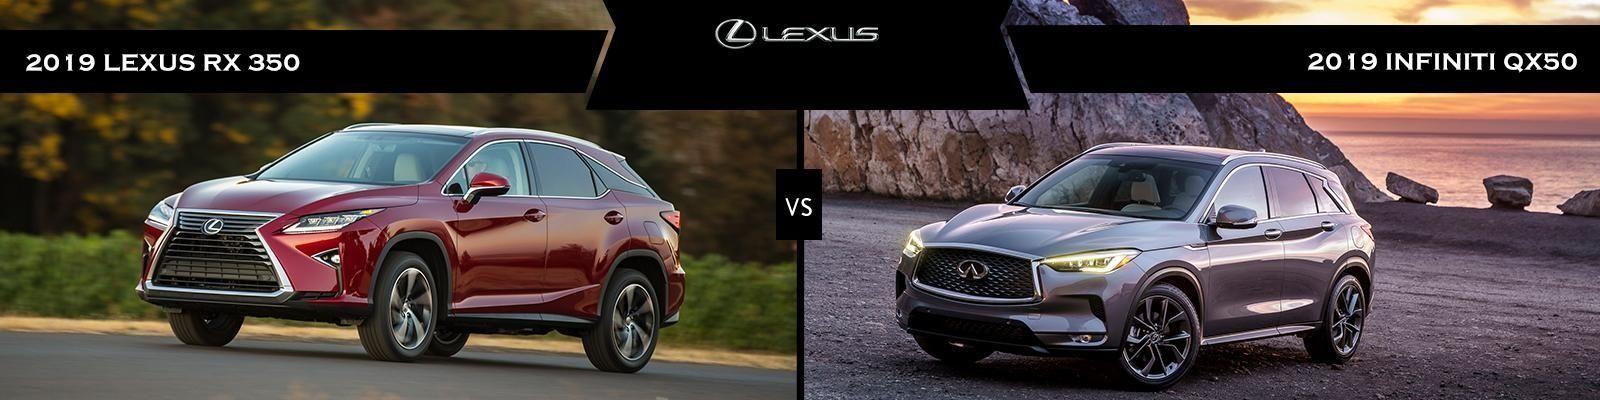 Infiniti Qx50 Vs Lexus Rx 350 Lexus Rx 350 Lexus Suv Comparison